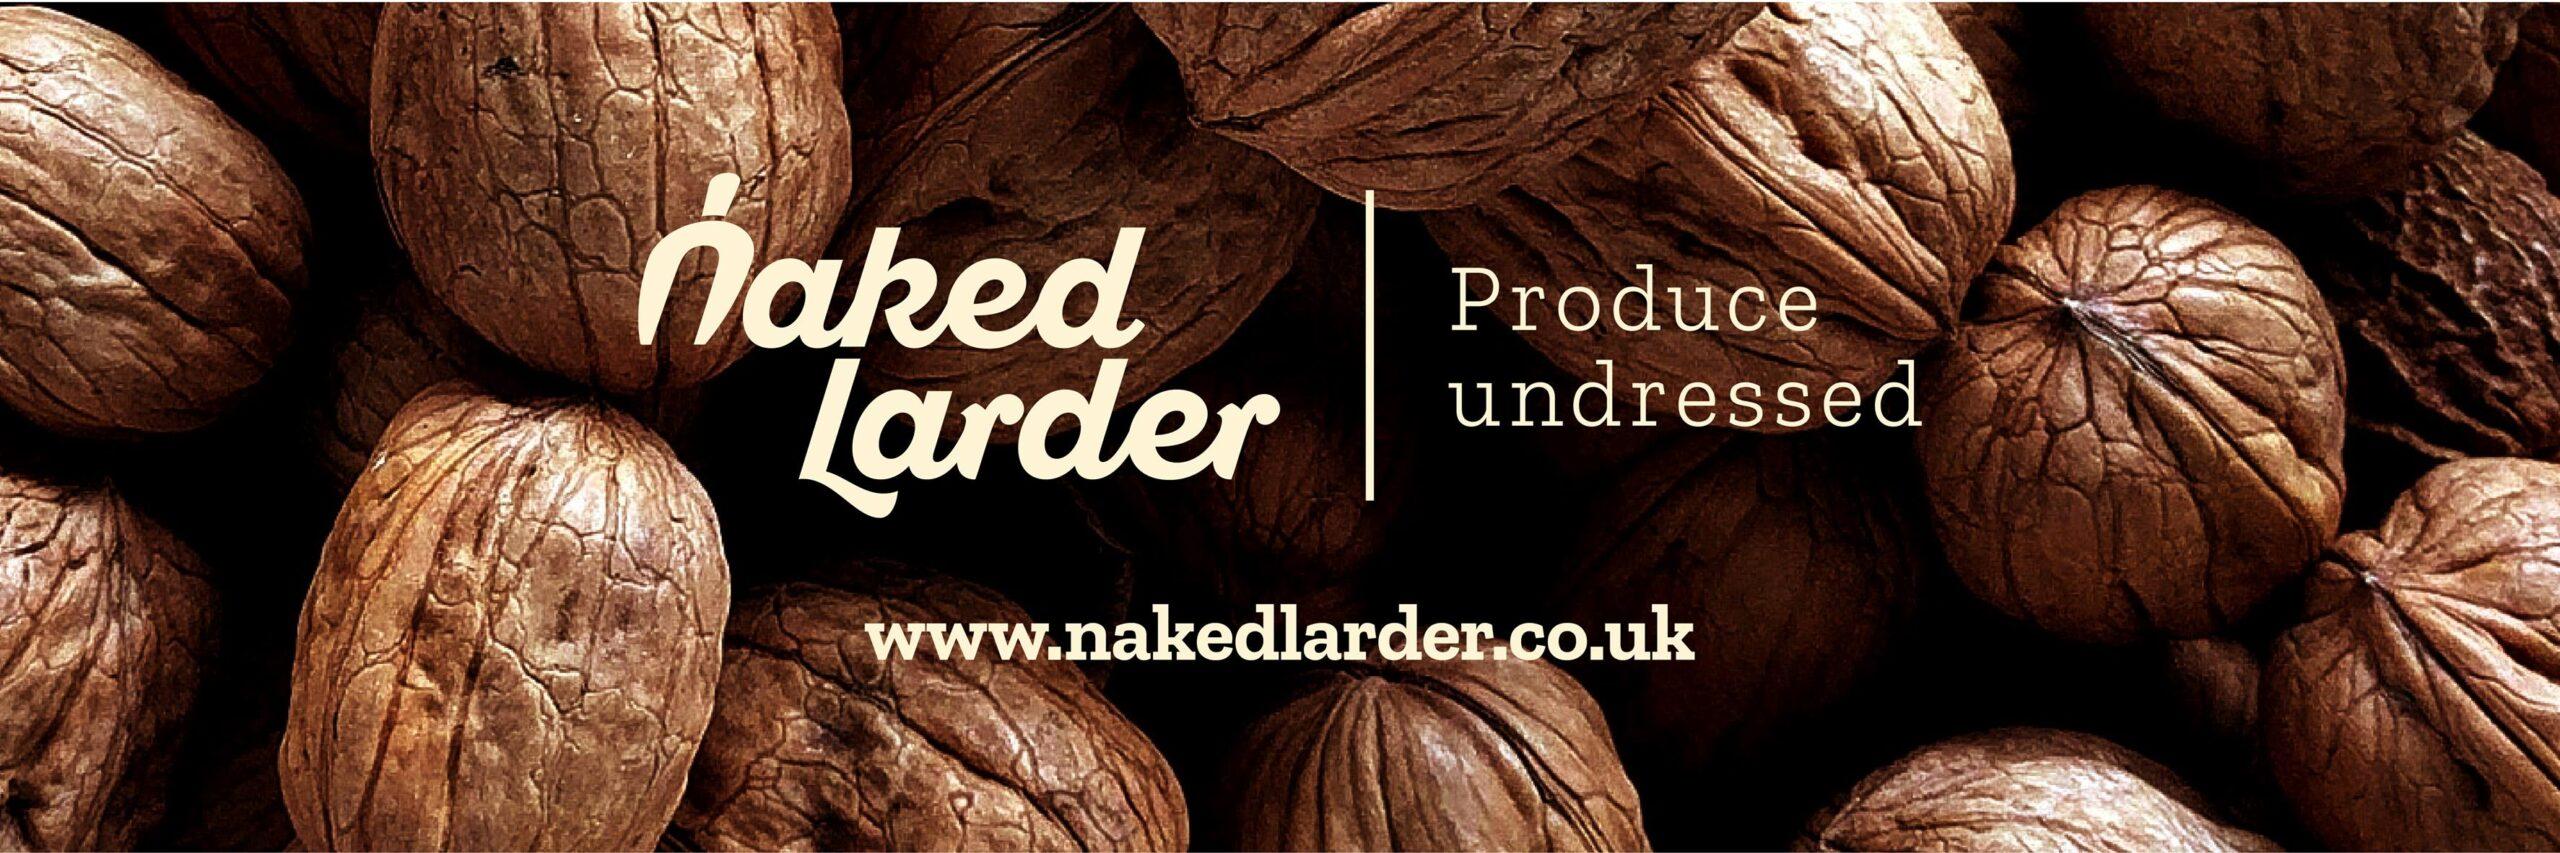 Naked Larder Hastings